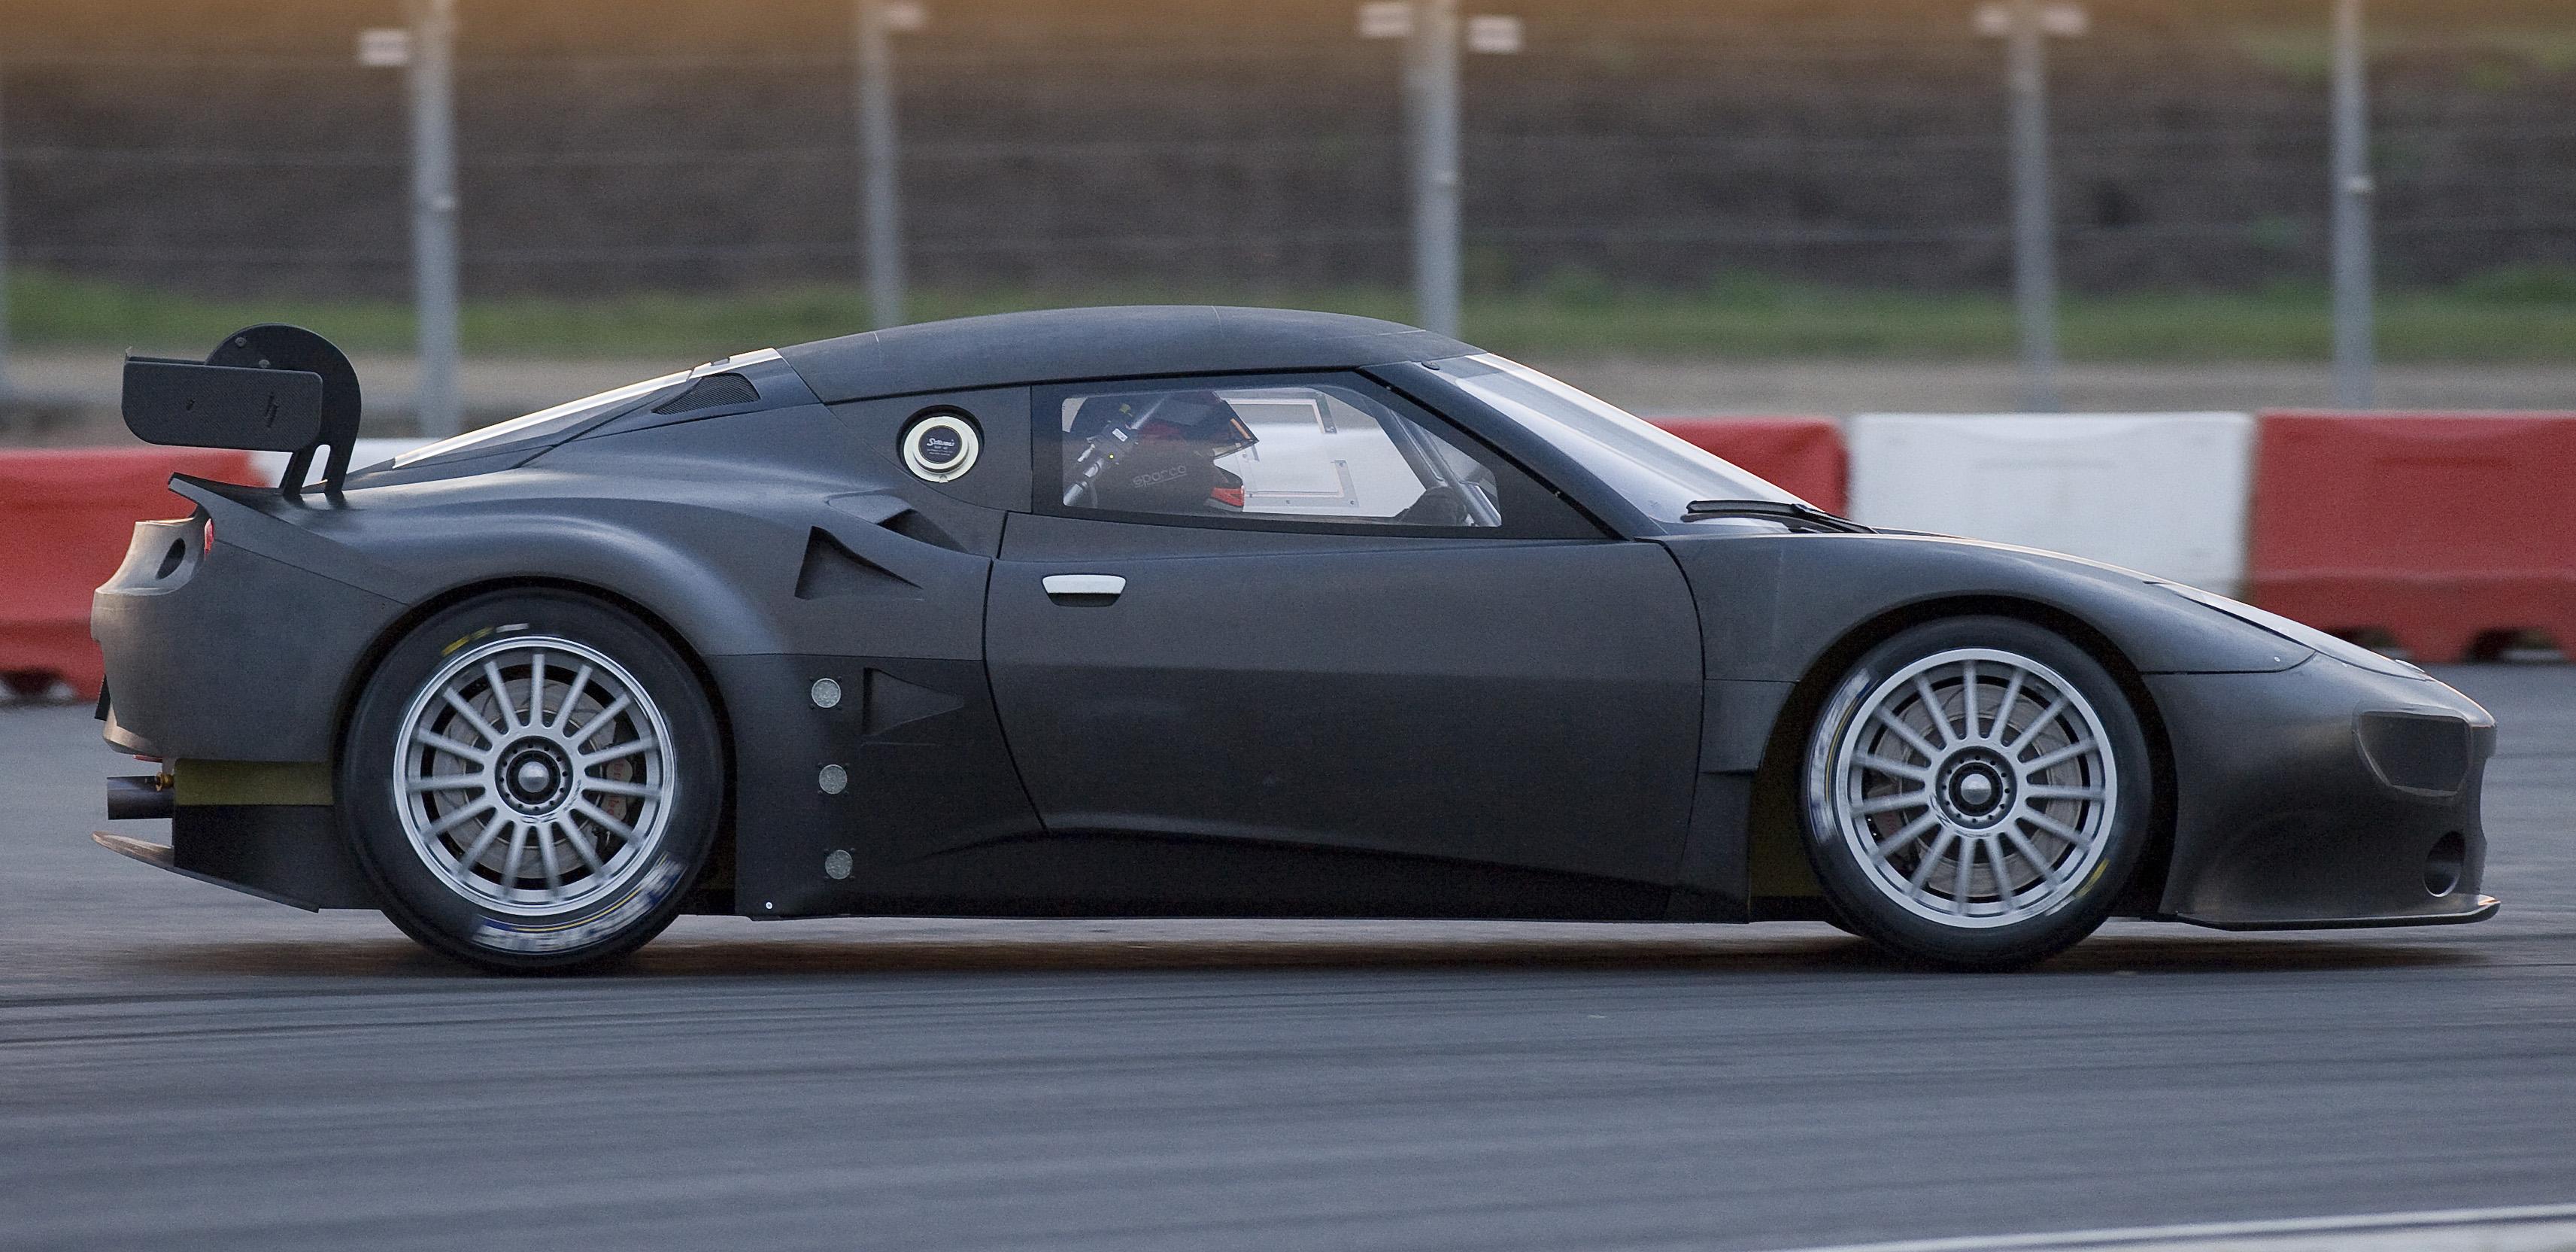 https://get.wallhere.com/photo/car-vehicle-sports-car-2013-performance-car-Lotus-netcarshow-netcar-car-images-car-photo-wheel-Evora-GTE-race-car-supercar-land-vehicle-automotive-design-race-car-automobile-make-luxury-vehicle-430096.jpg